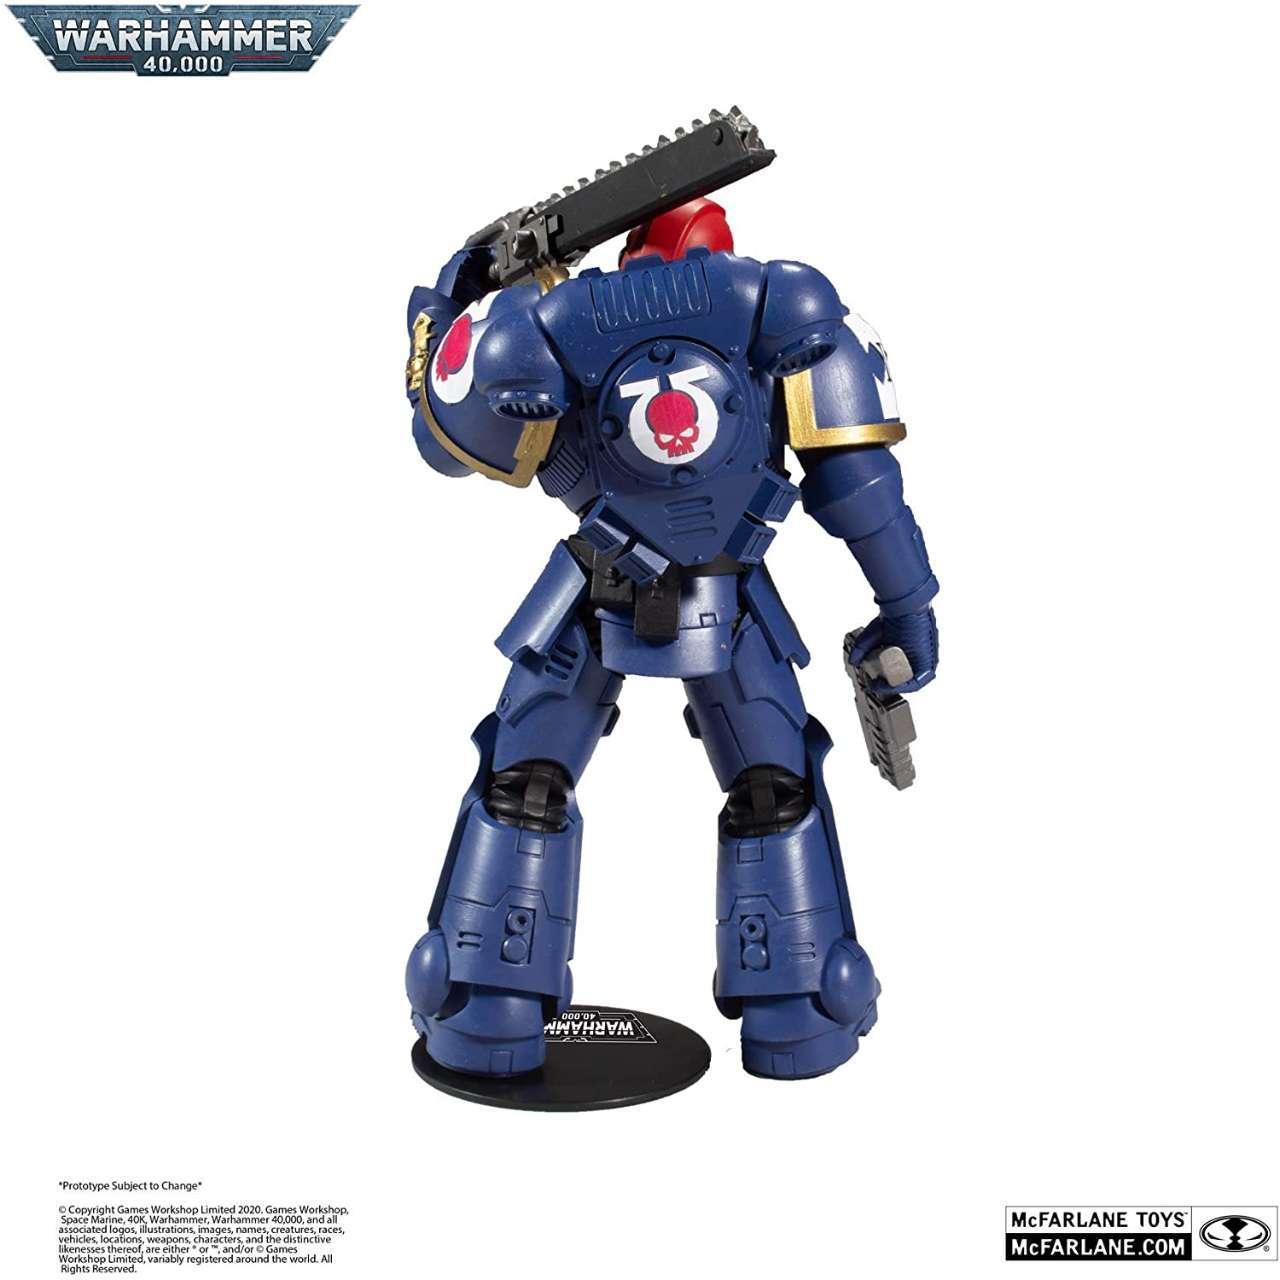 mcfarlane-warhammer-4000071LD7XtAWSL_AC_SL1500_